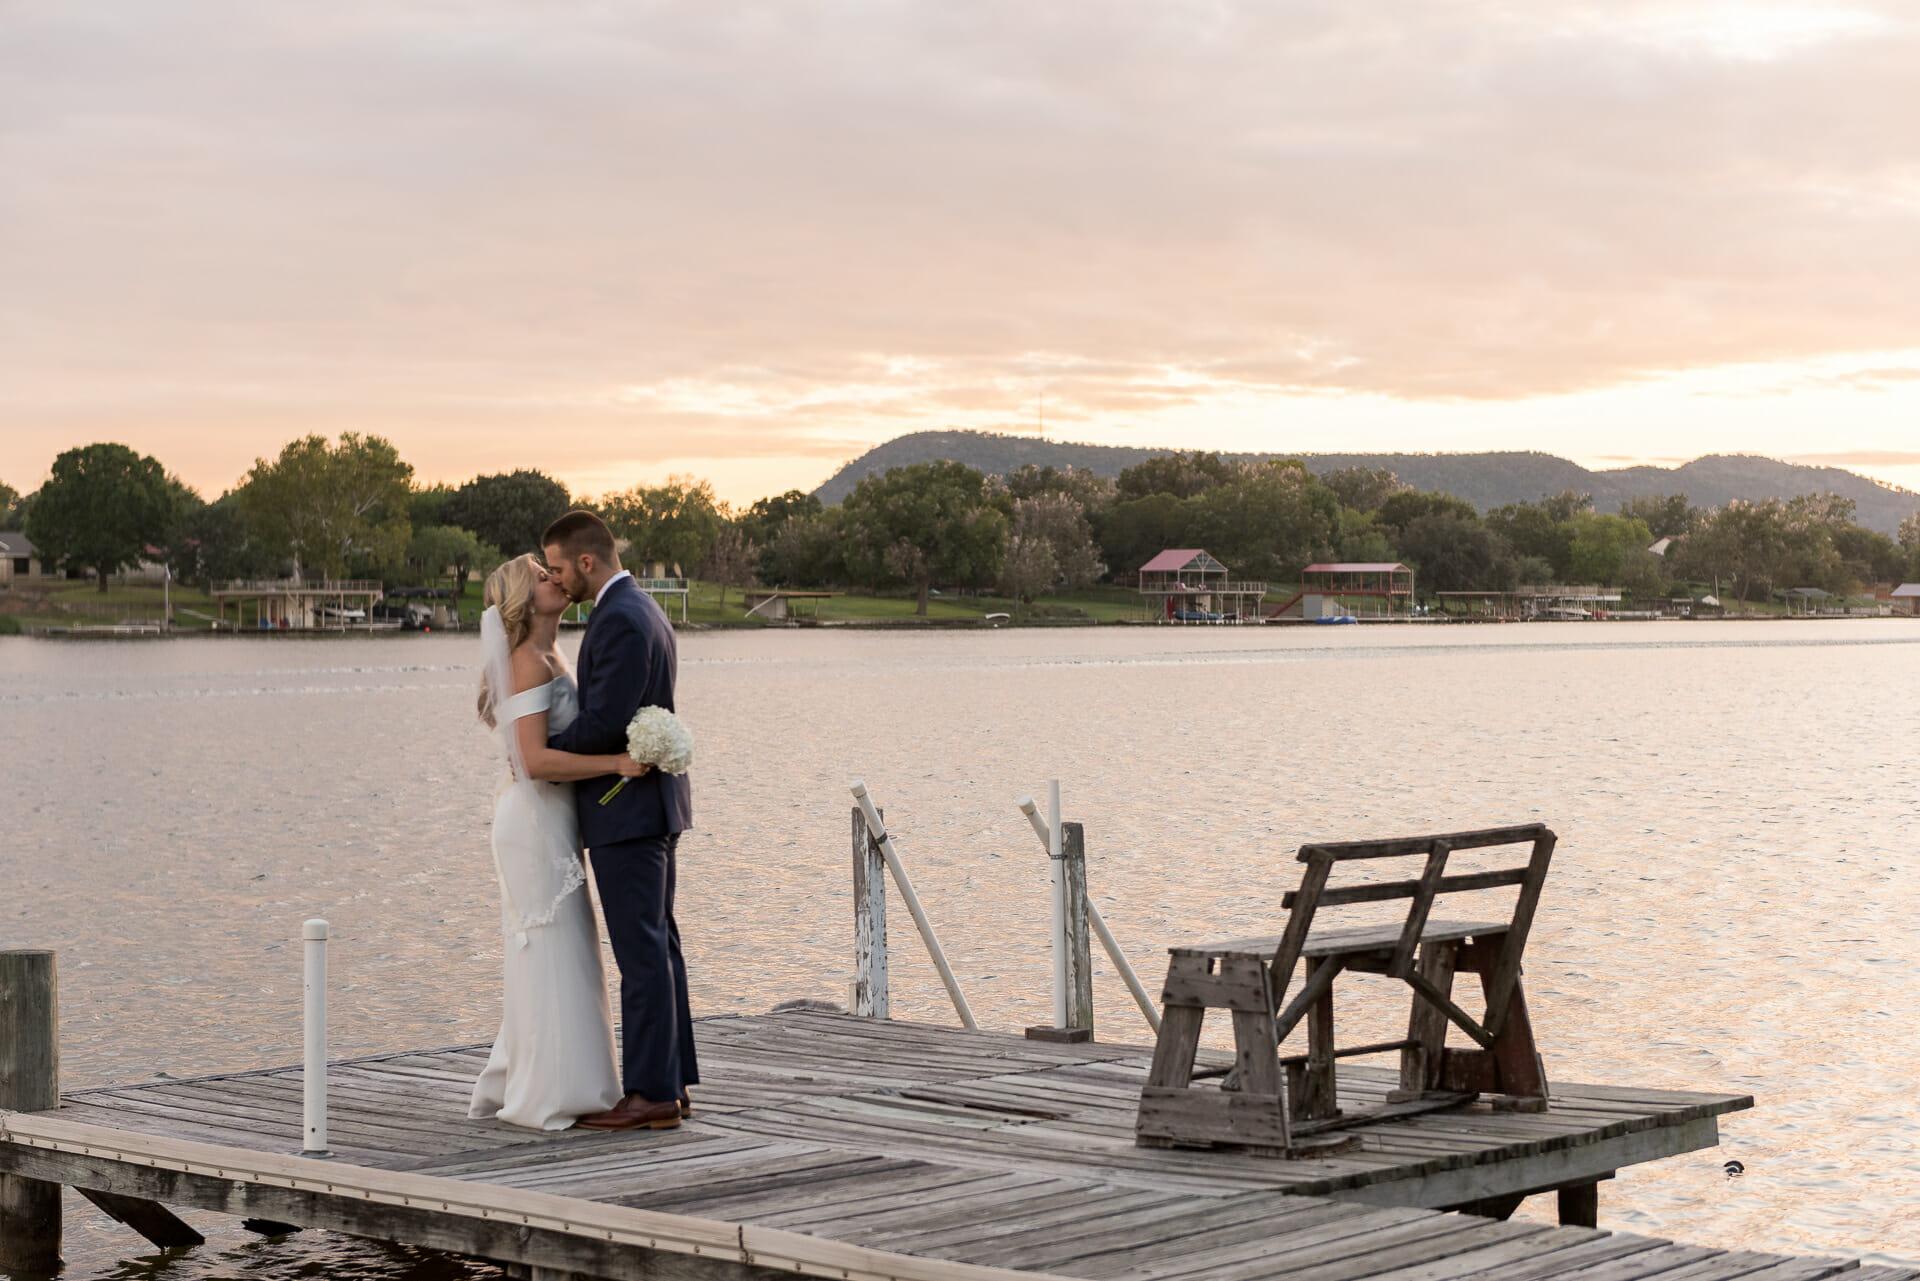 Wedding Photography by Dustin Meyer | Elizabeth and Kyle